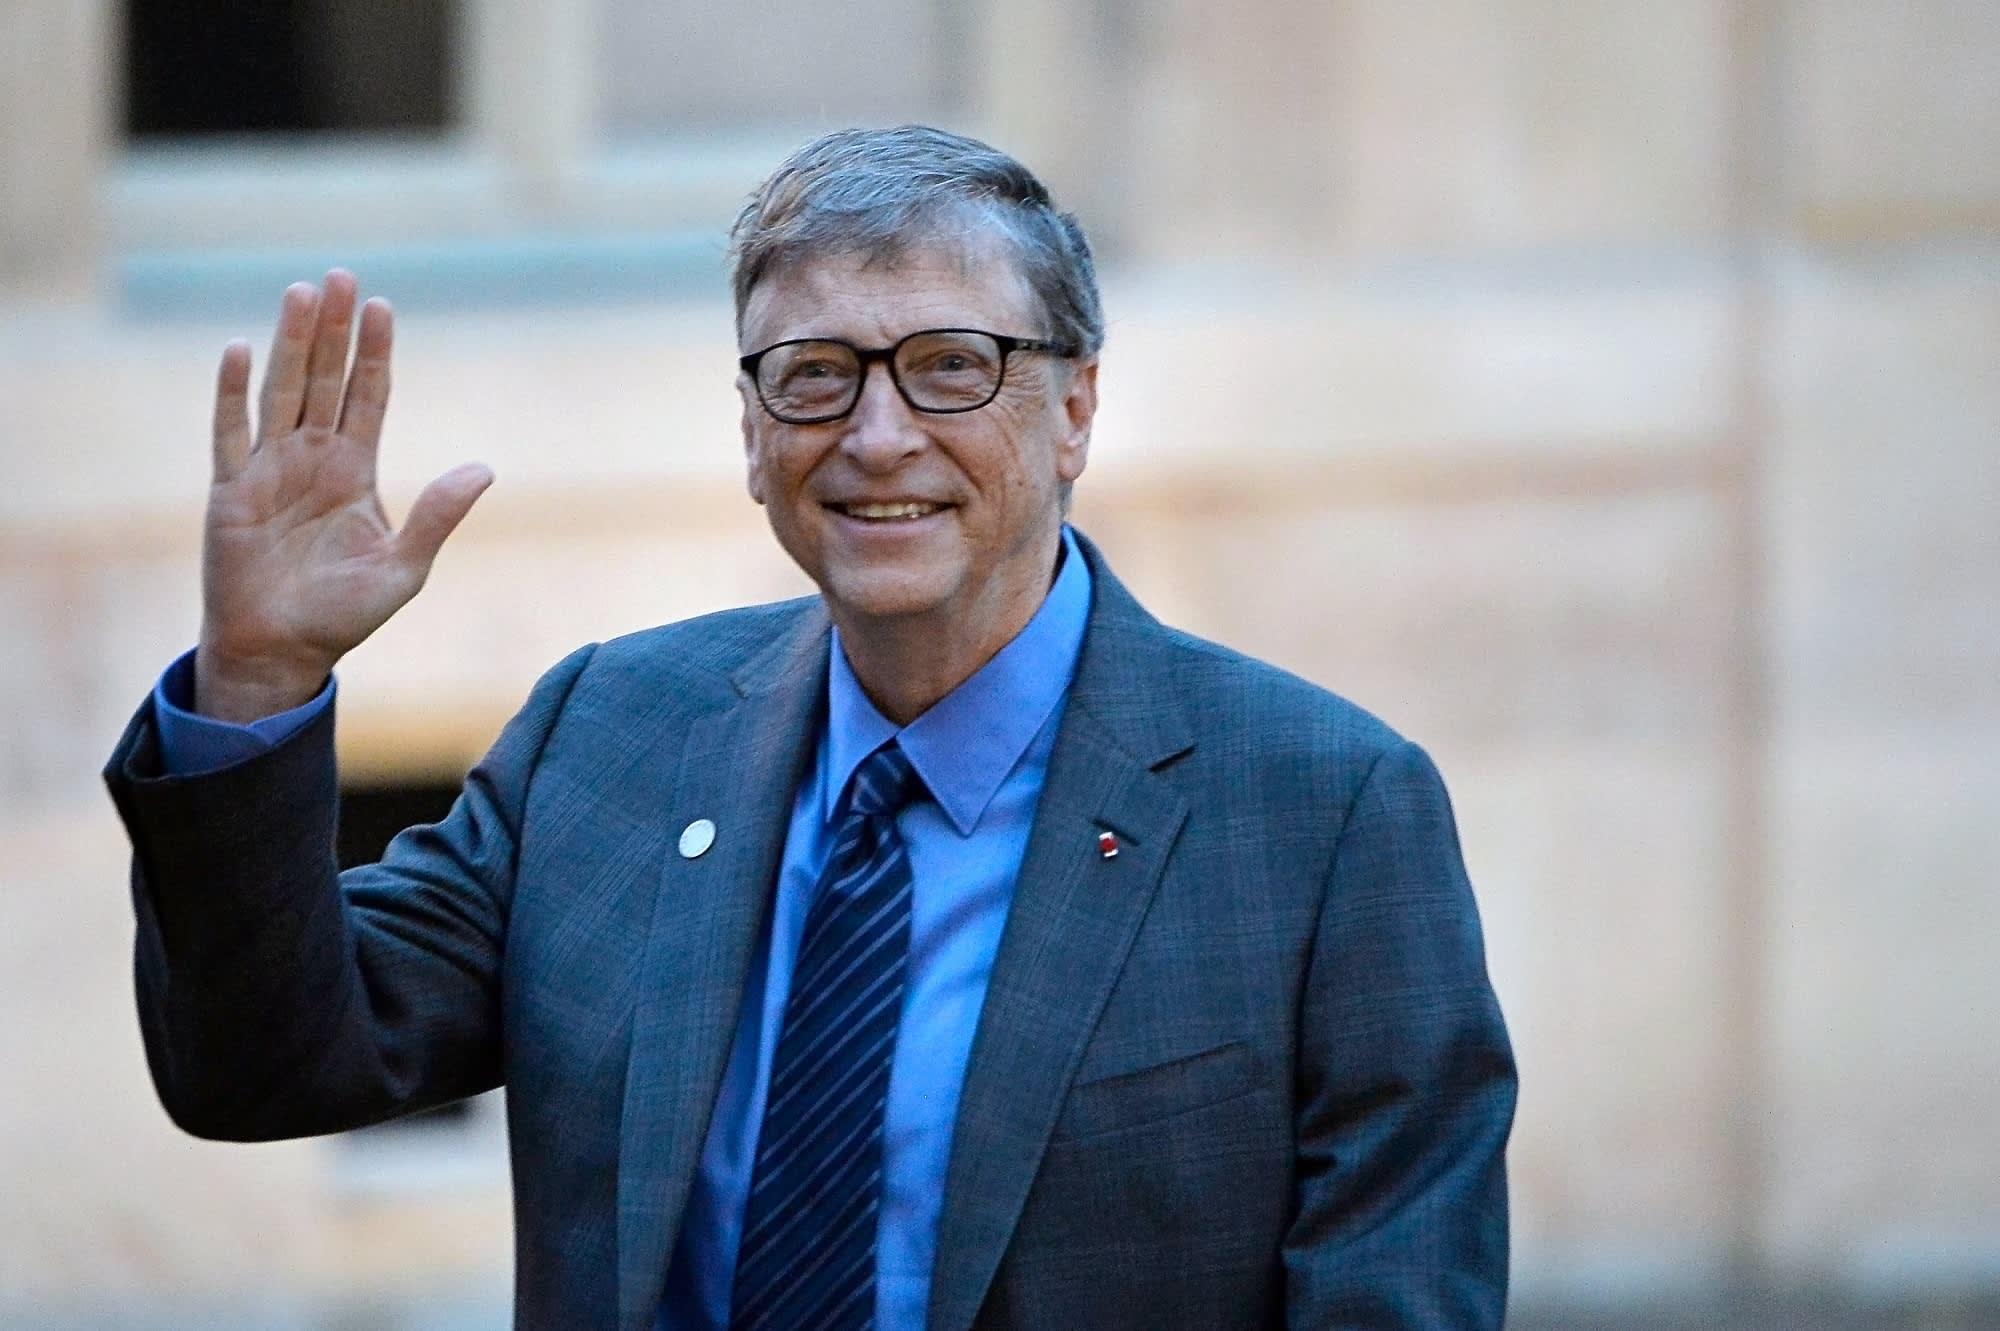 3 ways Bill Gates is spending billions to change the world